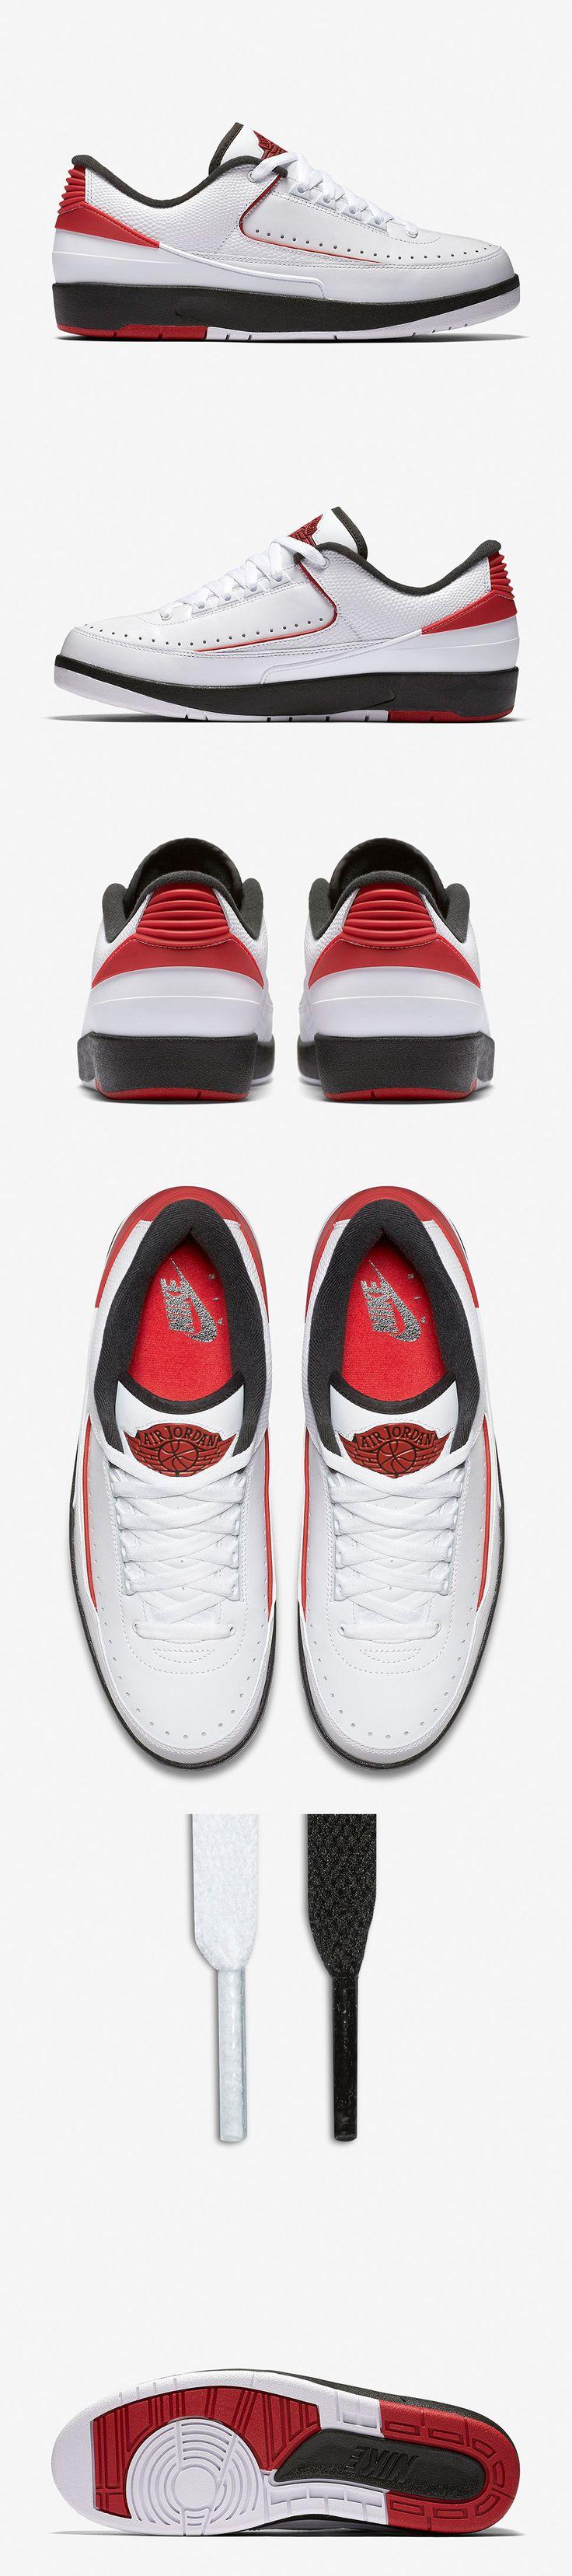 "Air Jordan 2 Retro Low ""Chicago"" - EU Kicks: Sneaker Magazine"